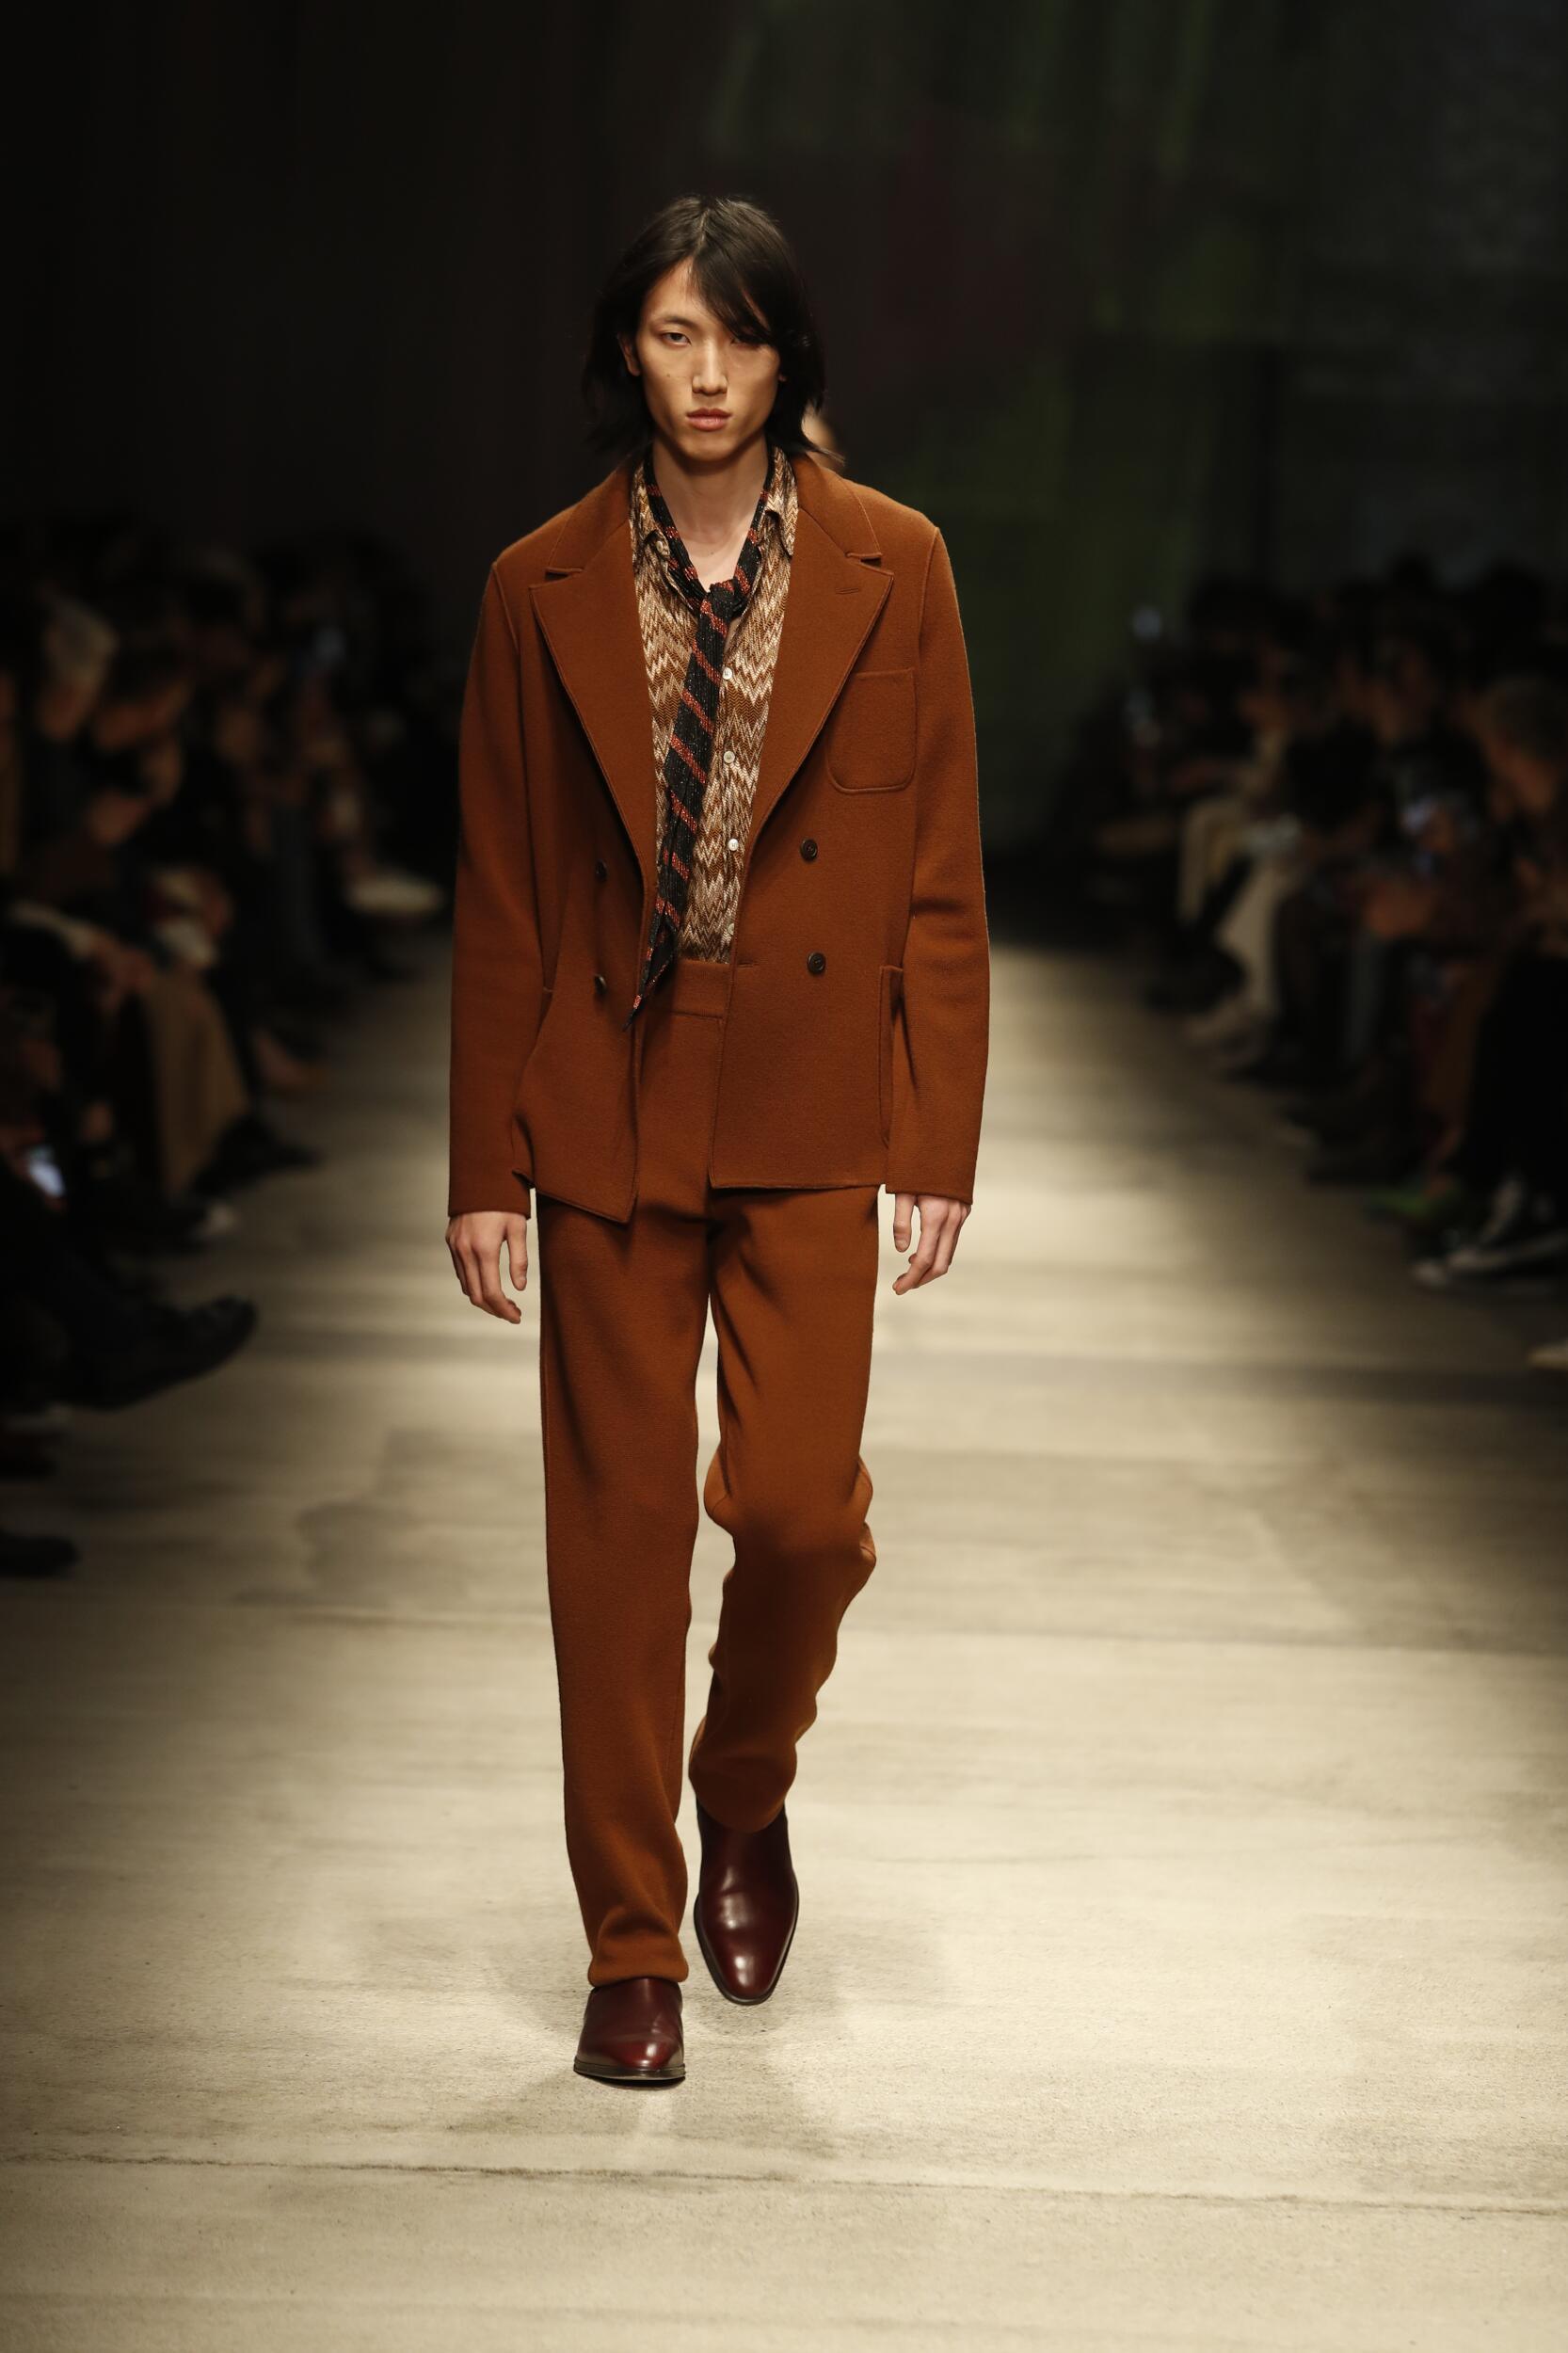 Fashion Show Man Model Missoni Catwalk